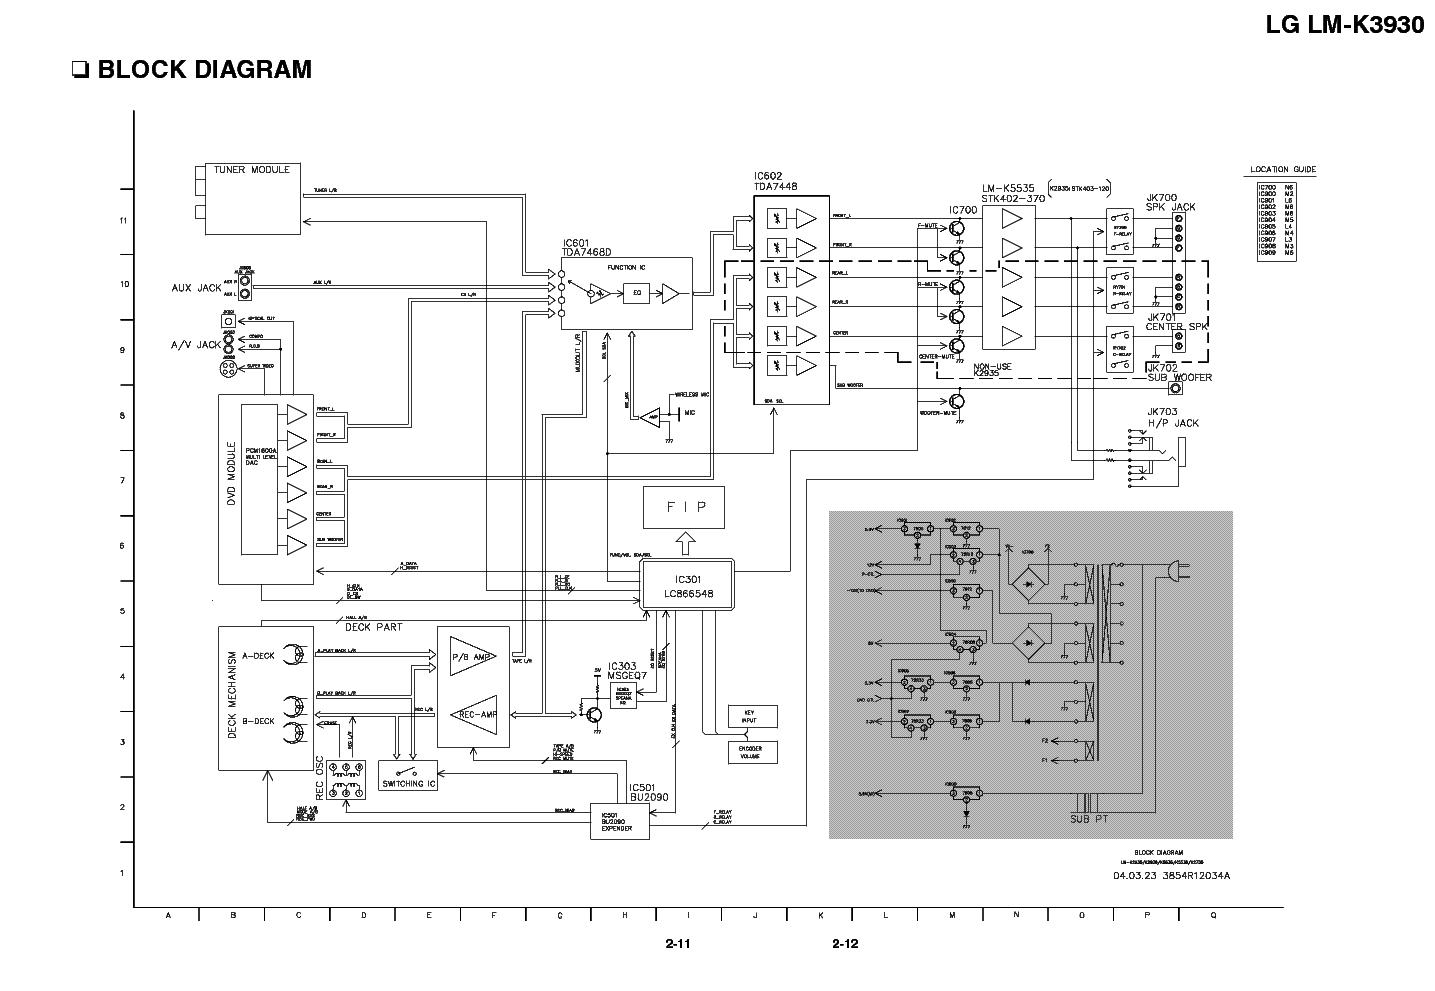 Lg Mbt506 Dvd Mini Hi Fi System Service Manual Msr 600 Software Diagram And W Tracking The Signal Go To Www Retrevo Com 230w Entertainment With Walmartcom